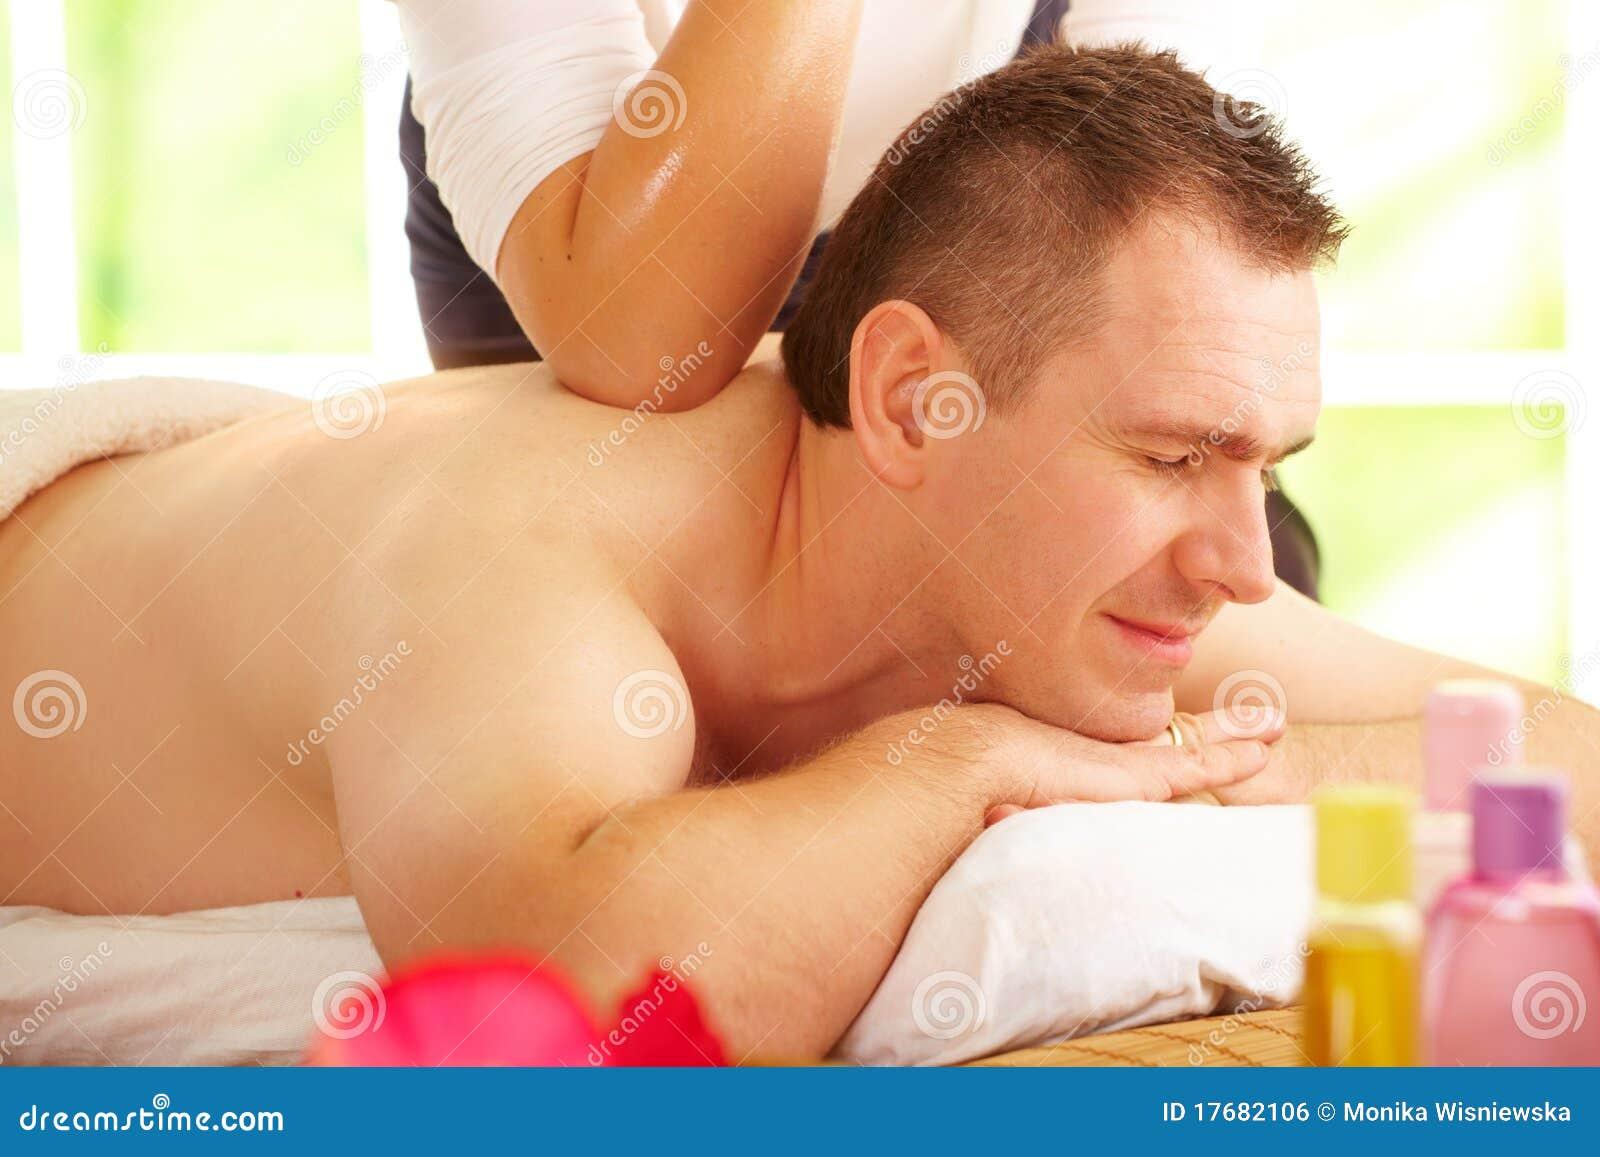 dejlig sex thai lanna wellness